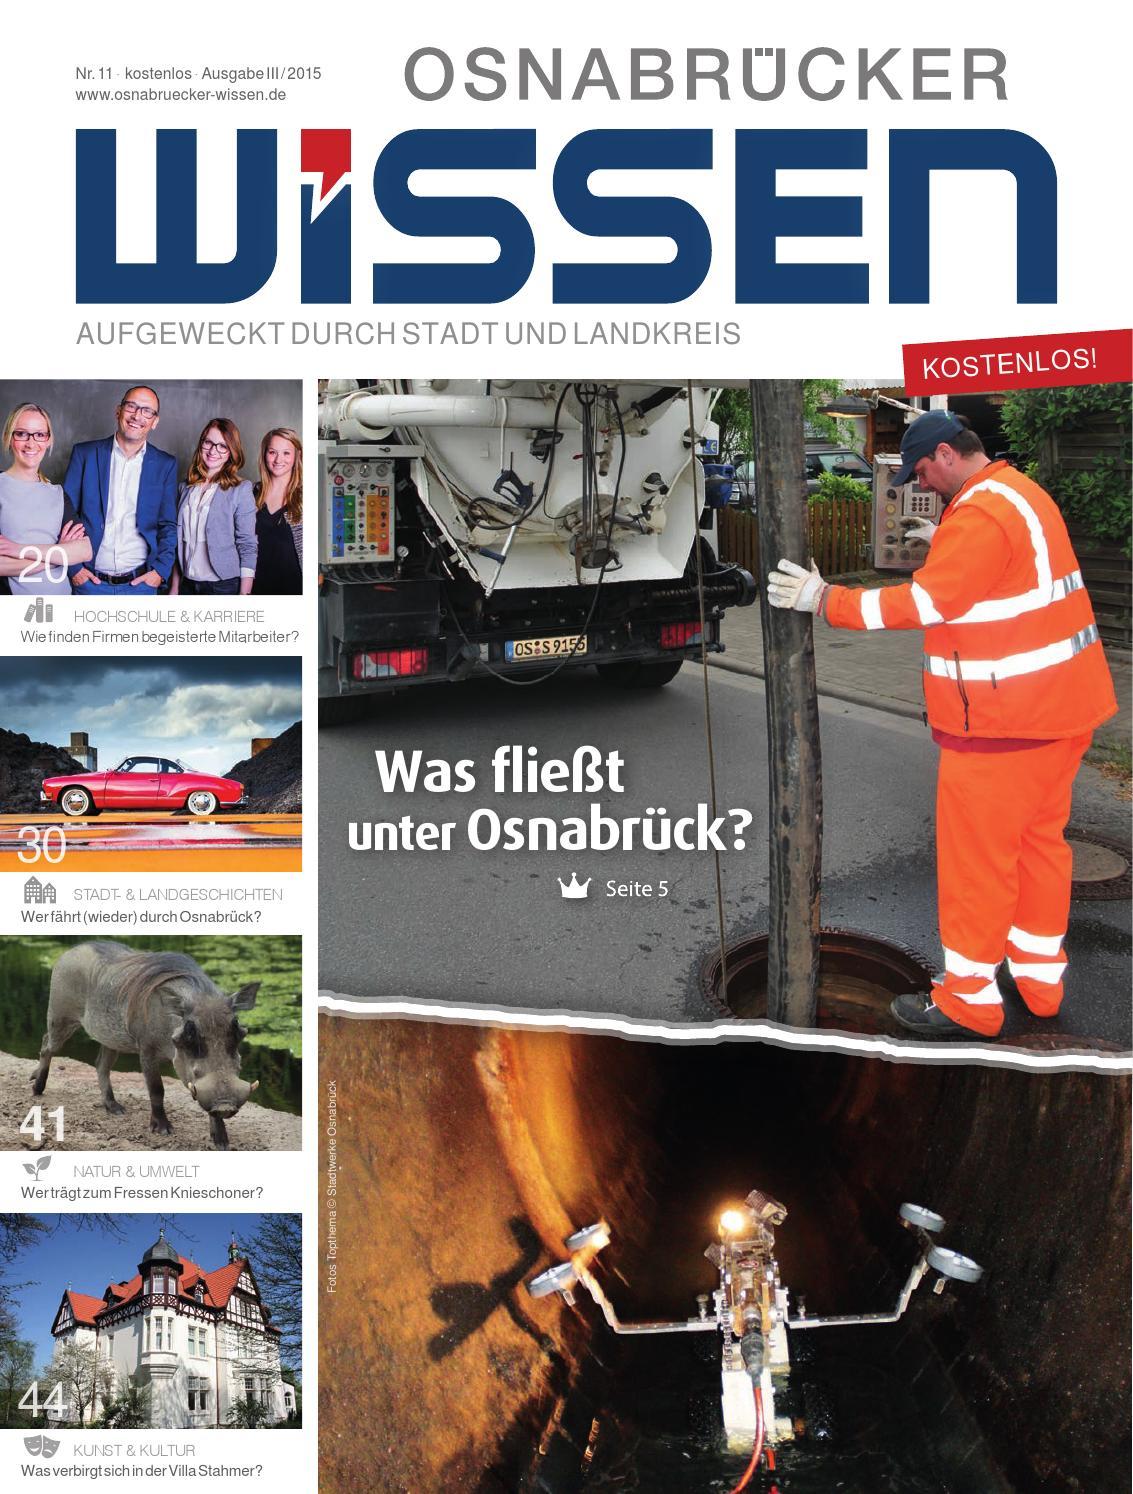 Nr. 11 (III-2015) - Osnabrücker Wissen by Osnabrücker Wissen - issuu